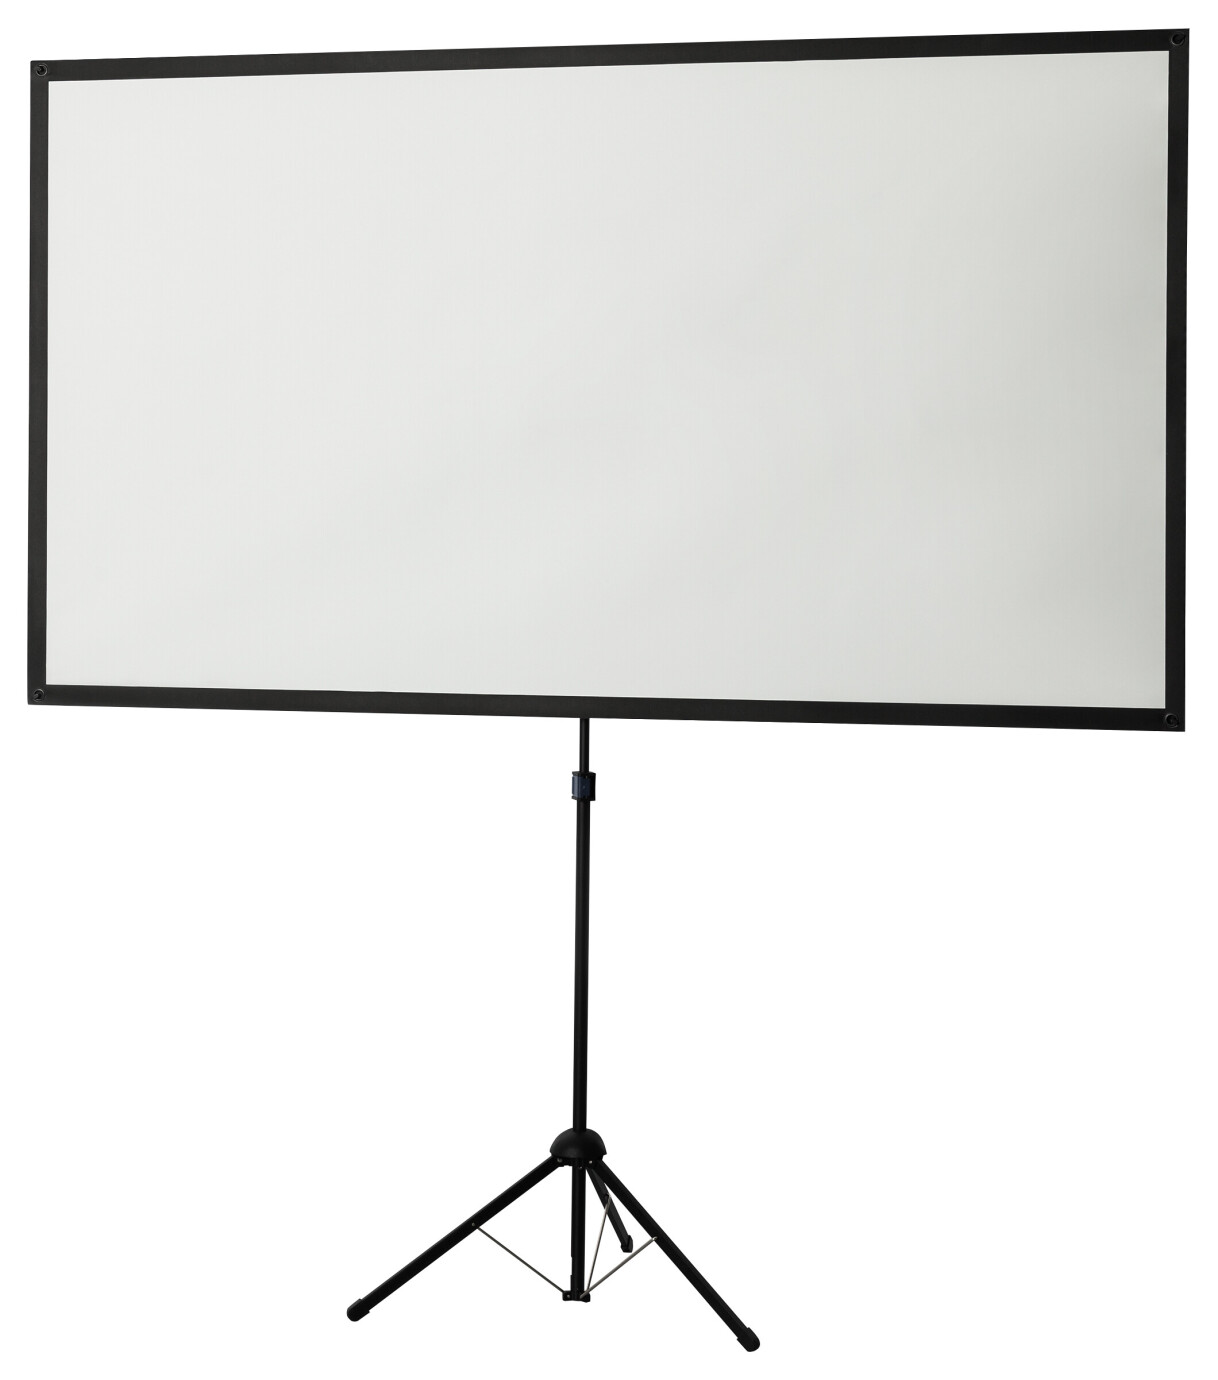 "celexon Ultra-Leightweight 177 x 100 cm ekran na trójnogu 16:9 (80"")"